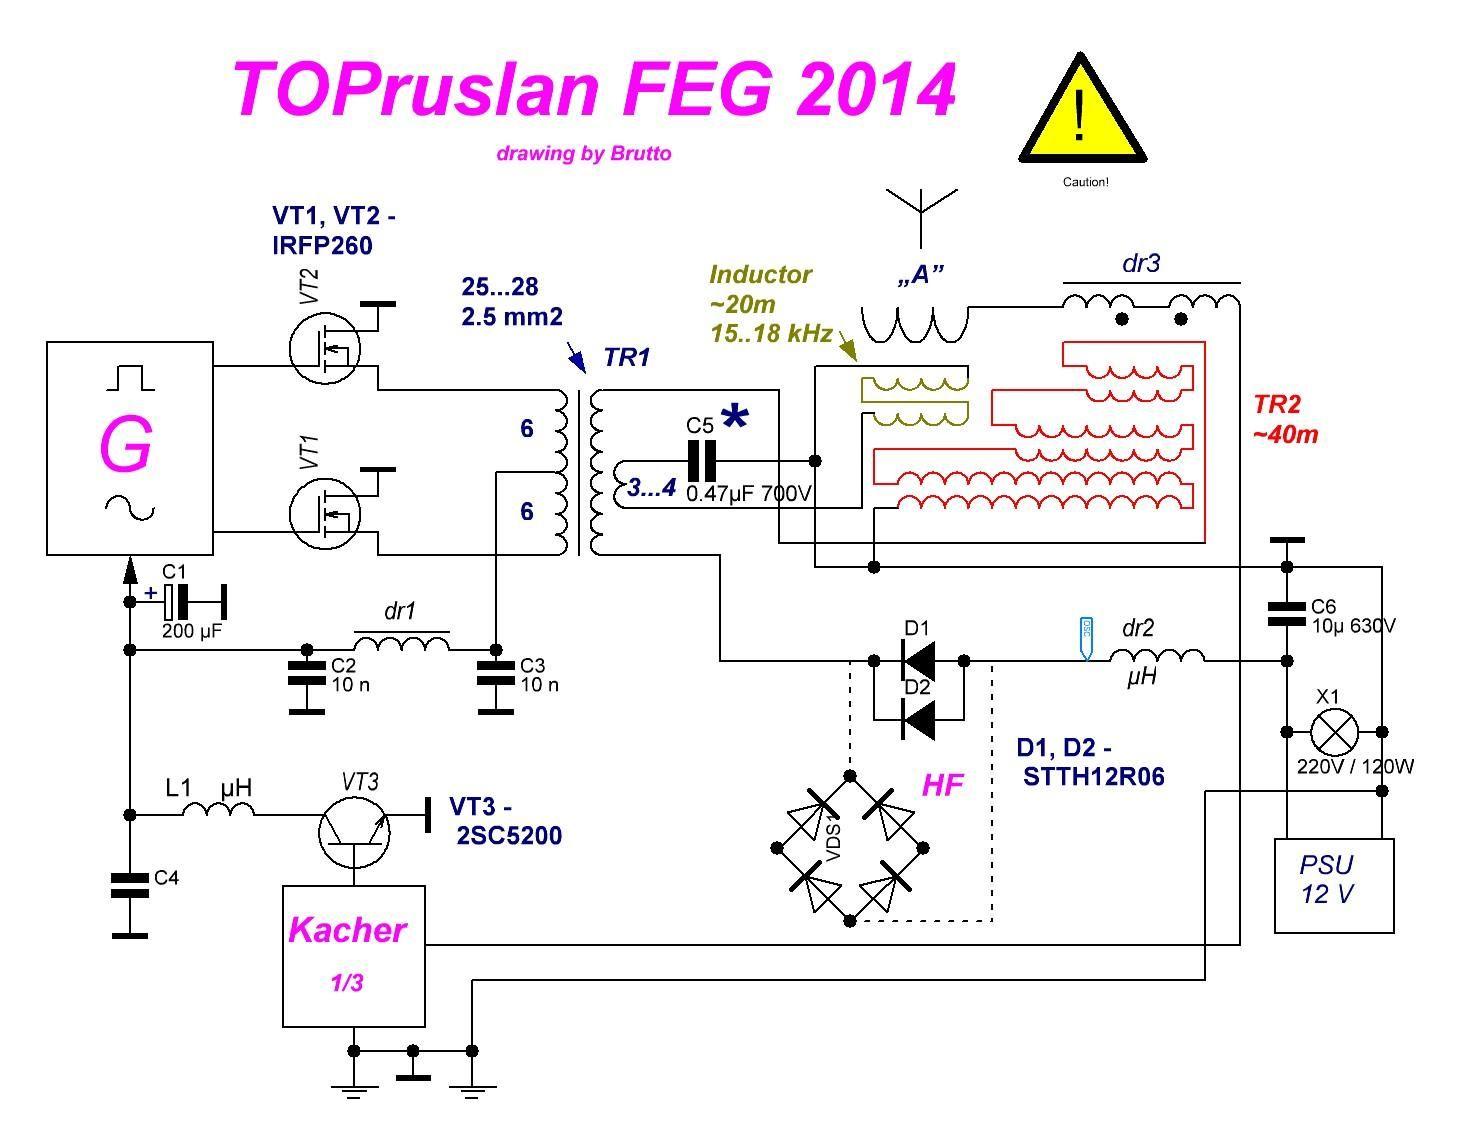 Kapanadze Generator Circuit Diagram - kapa energy device ... on